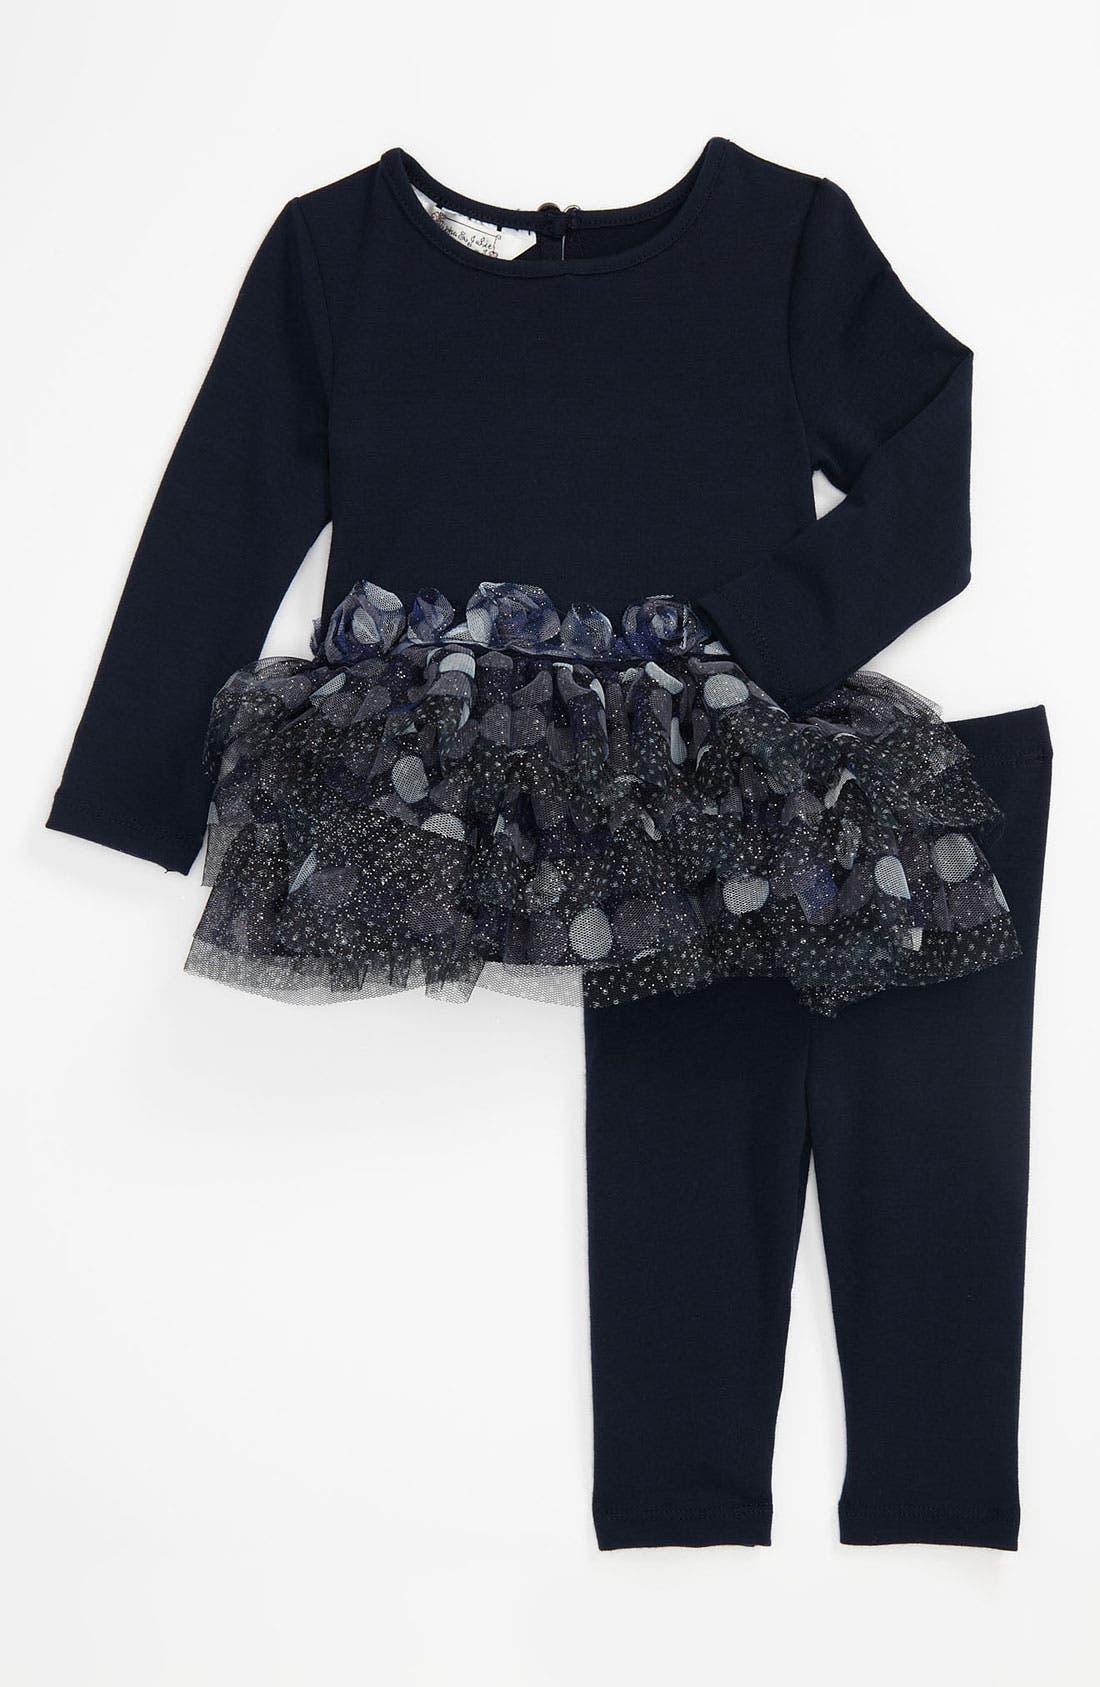 Main Image - Pippa & Julie Knit Top & Leggings (Infant)